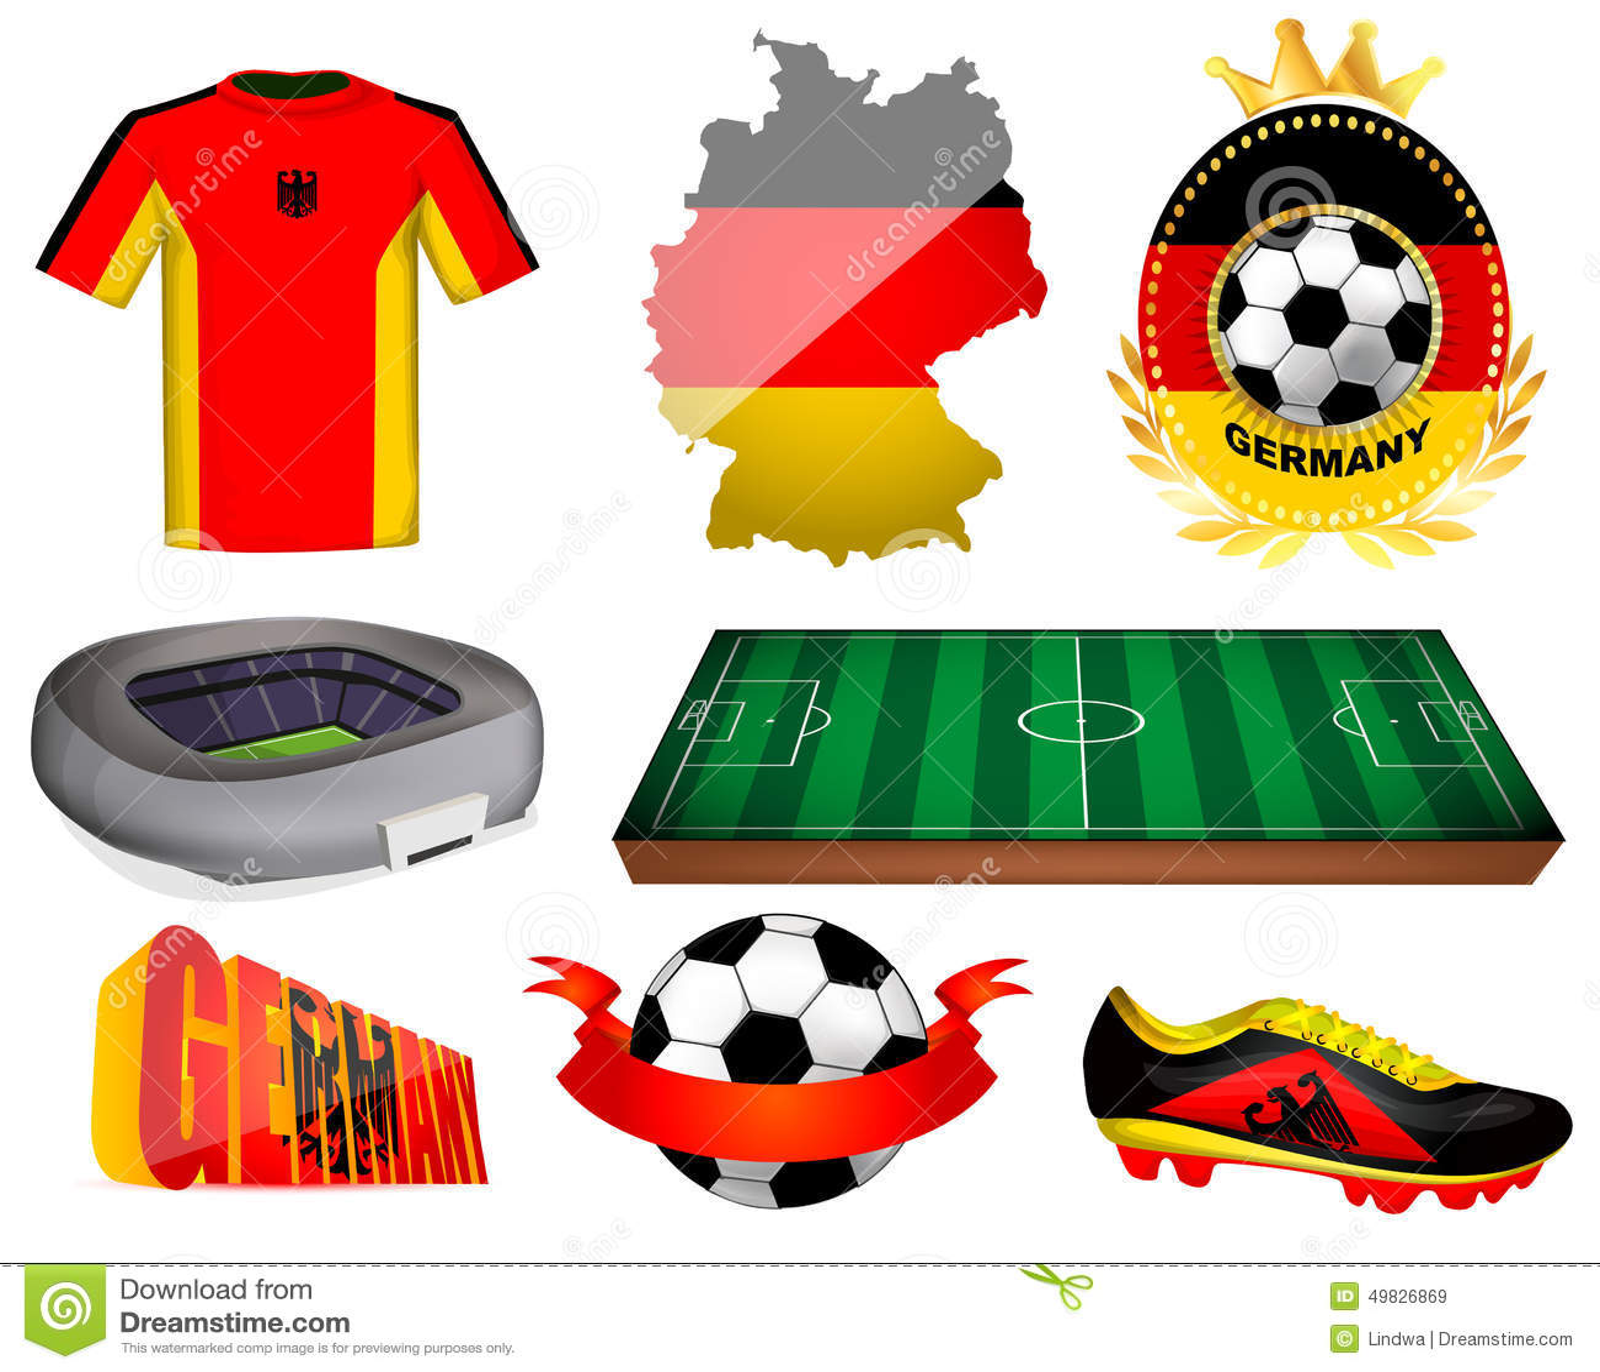 German Football Team Logo - Vector Download